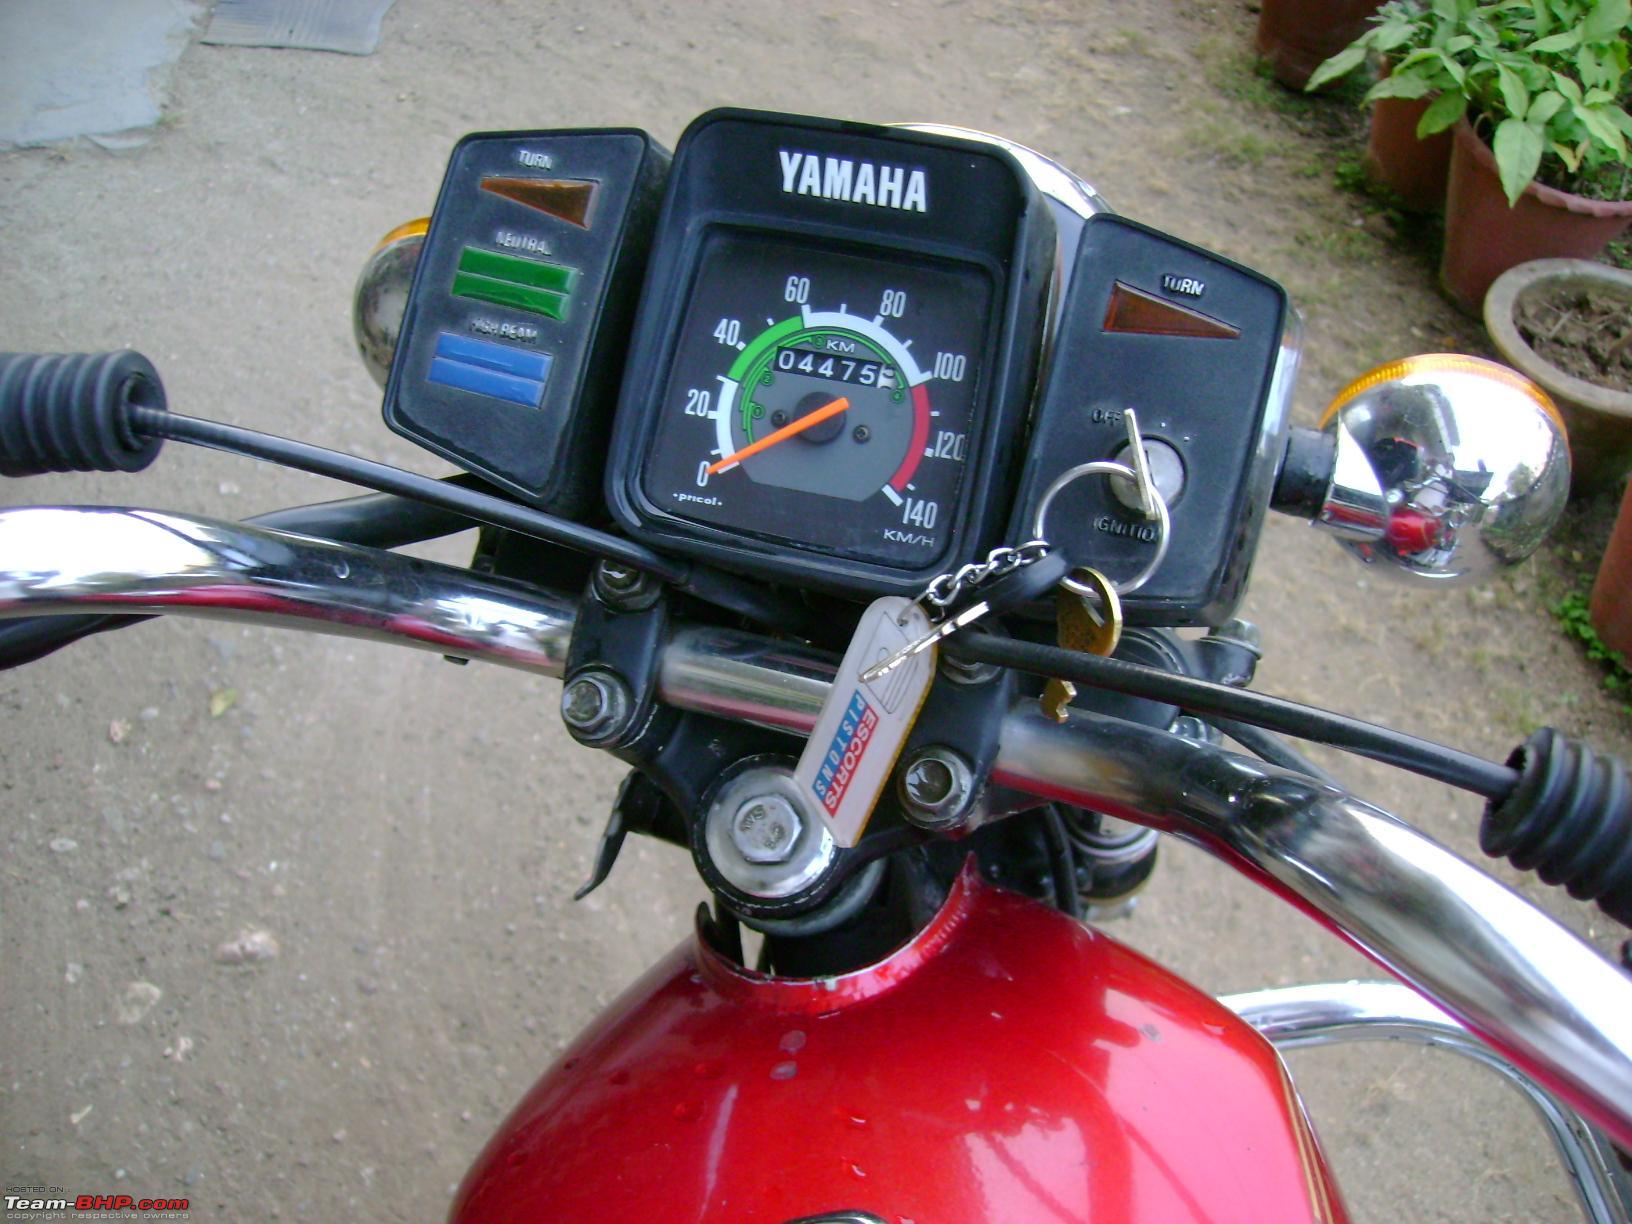 YAMAHA RX 100 red